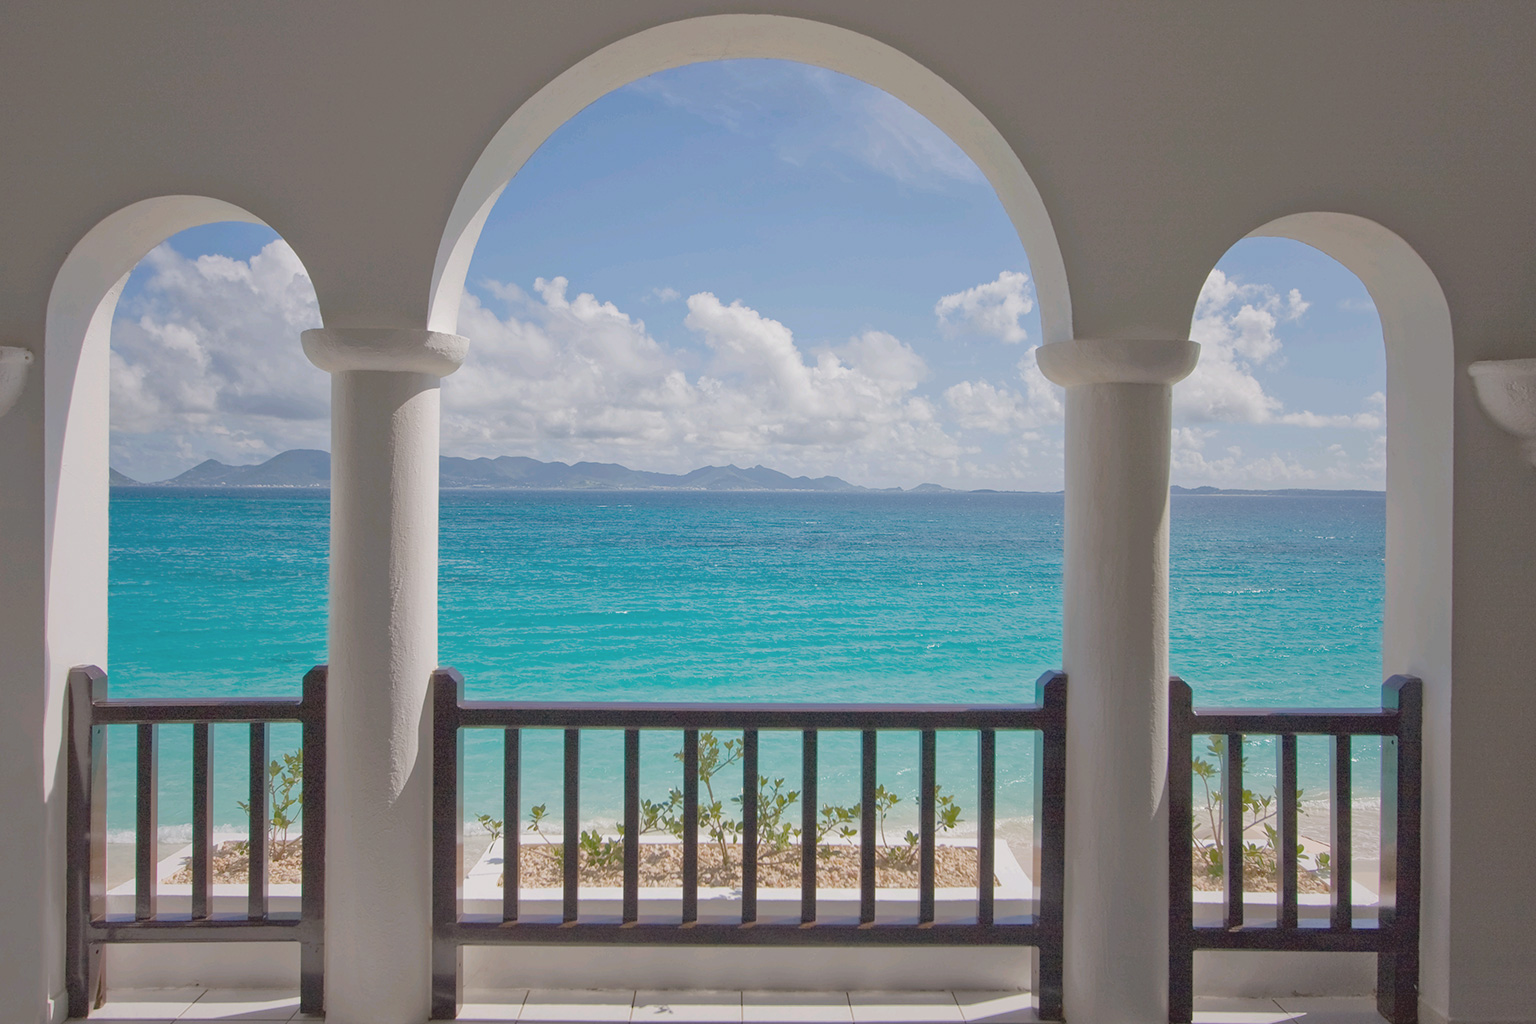 belmond cap juluca luxushotels in der karibik bei. Black Bedroom Furniture Sets. Home Design Ideas